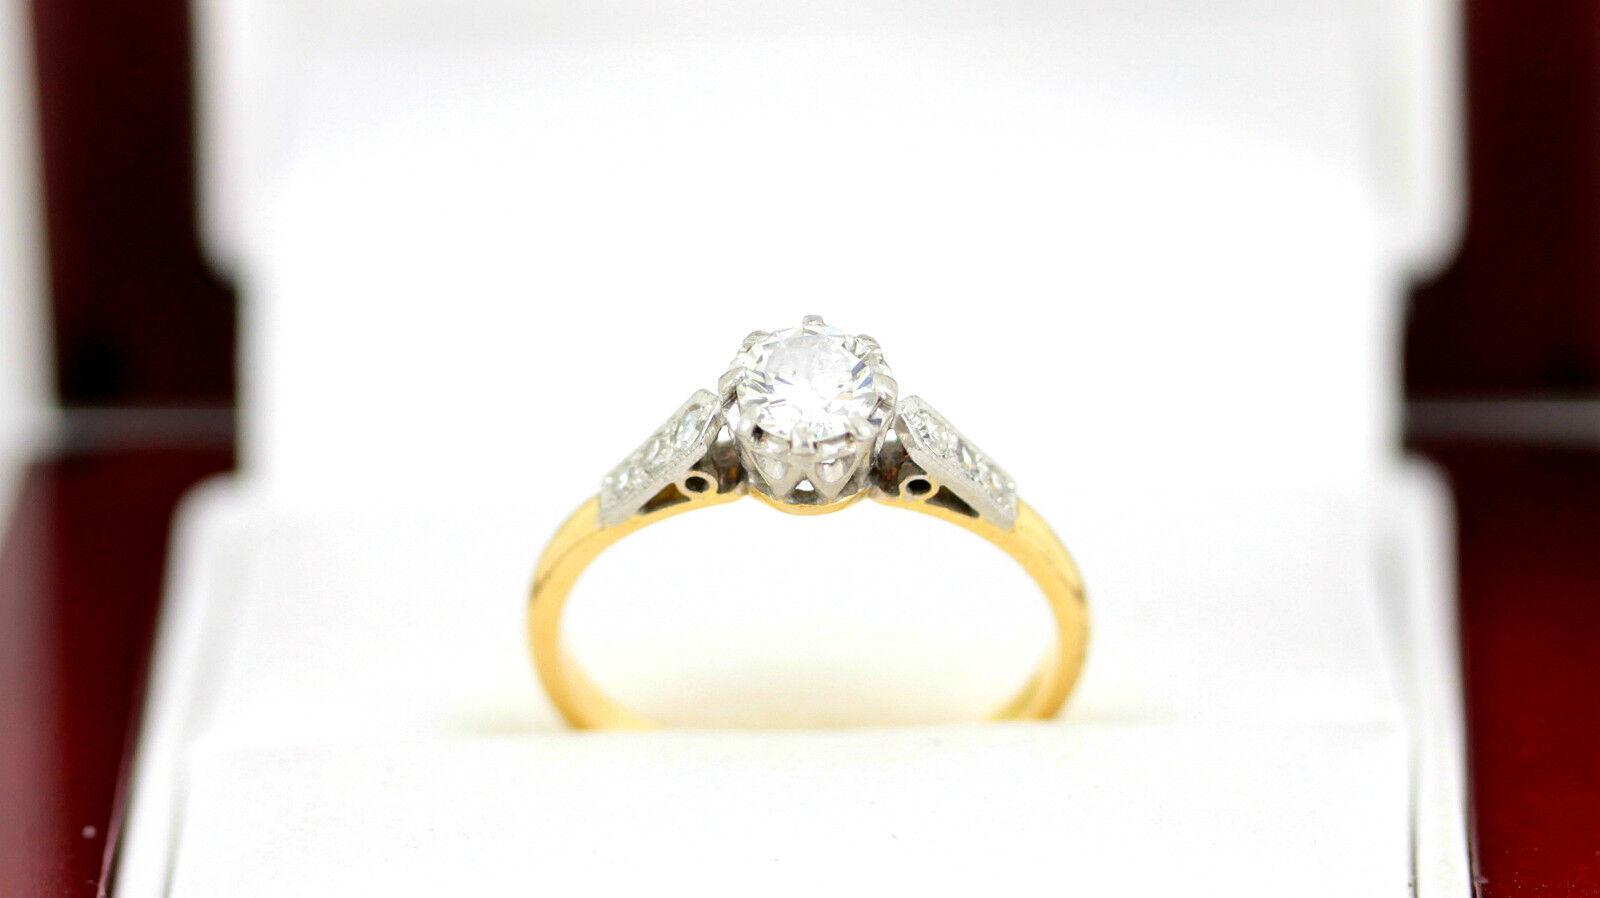 Exceptional Diamond Solitaire Ring 18ct gold Platinum Ladies Size K 1 2 L70